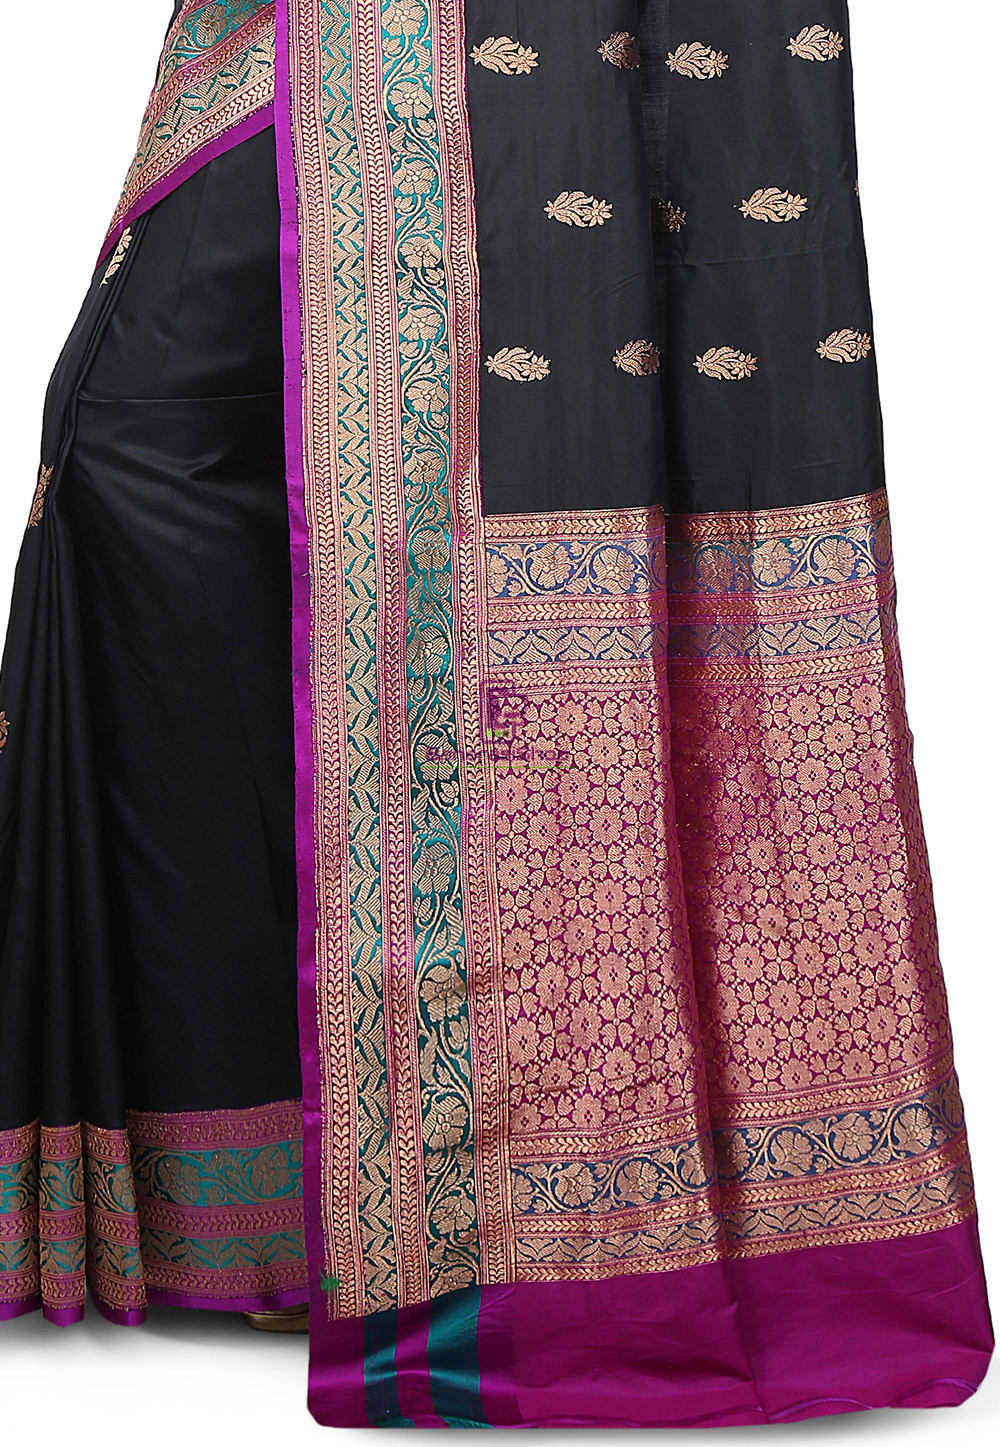 Banarasi Pure Katan Silk Handloom Saree in Black 3